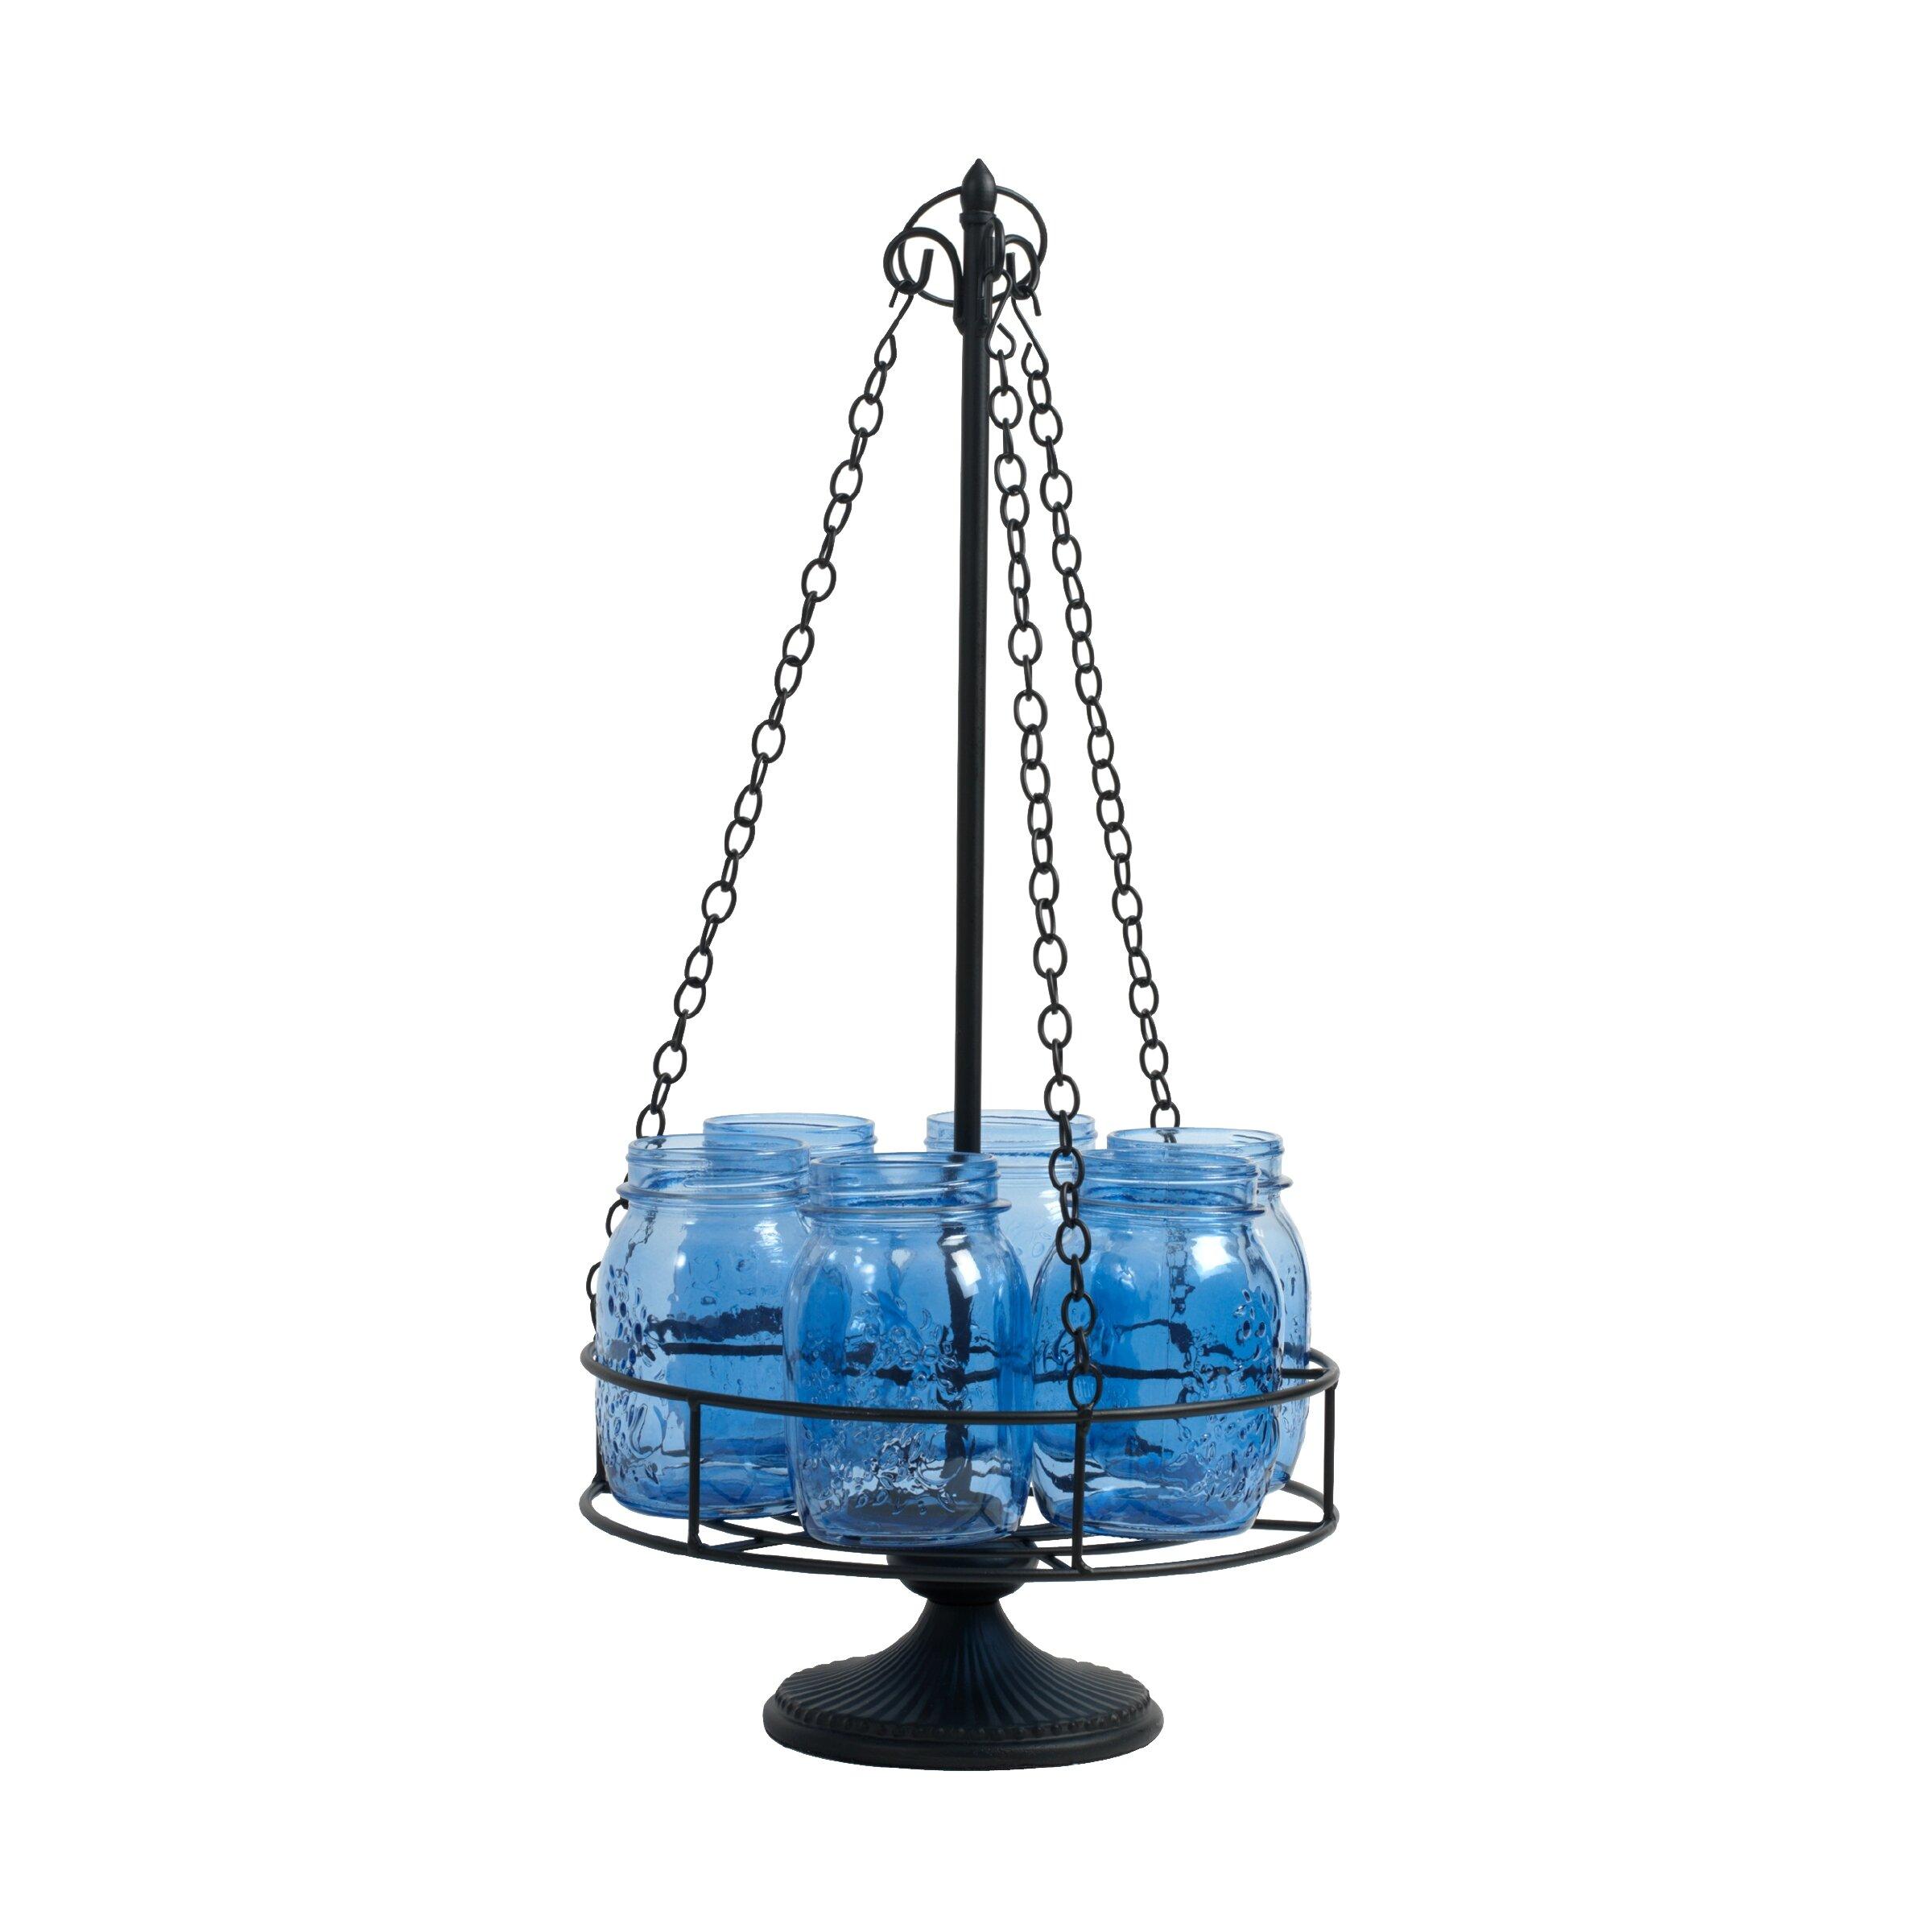 Stargaze Set Of 2 Hanging Mason Jar Pendant Lights By: Pfaltzgraff 6-Light Mason Jar Chandelier Centerpiece